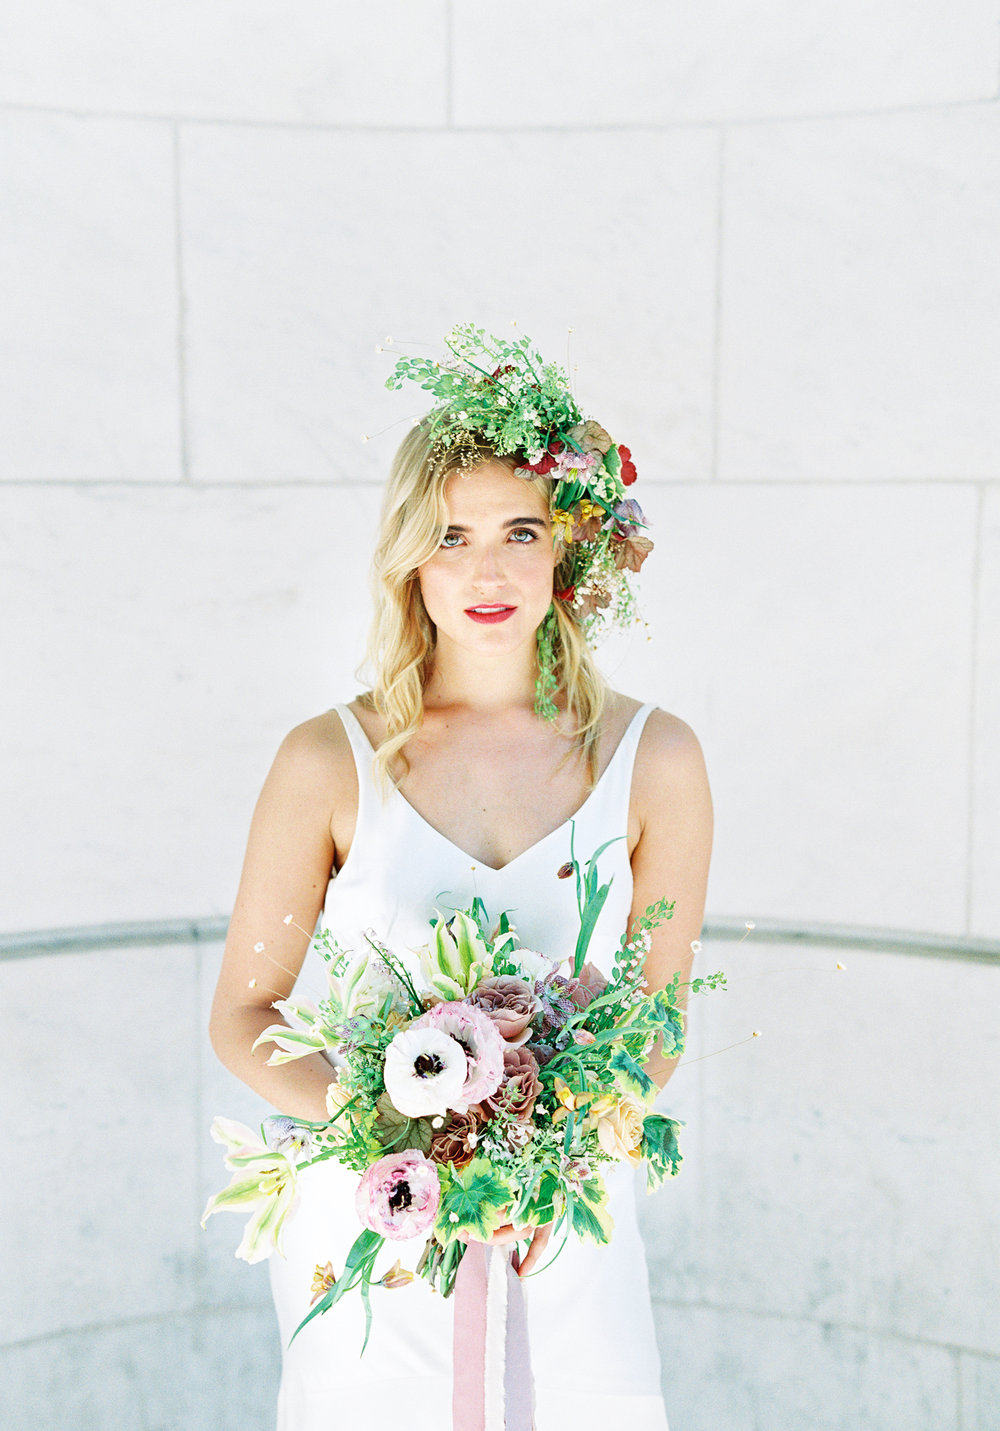 20180508-Pura-Soul-Photo-nyc-bridal--20.jpg